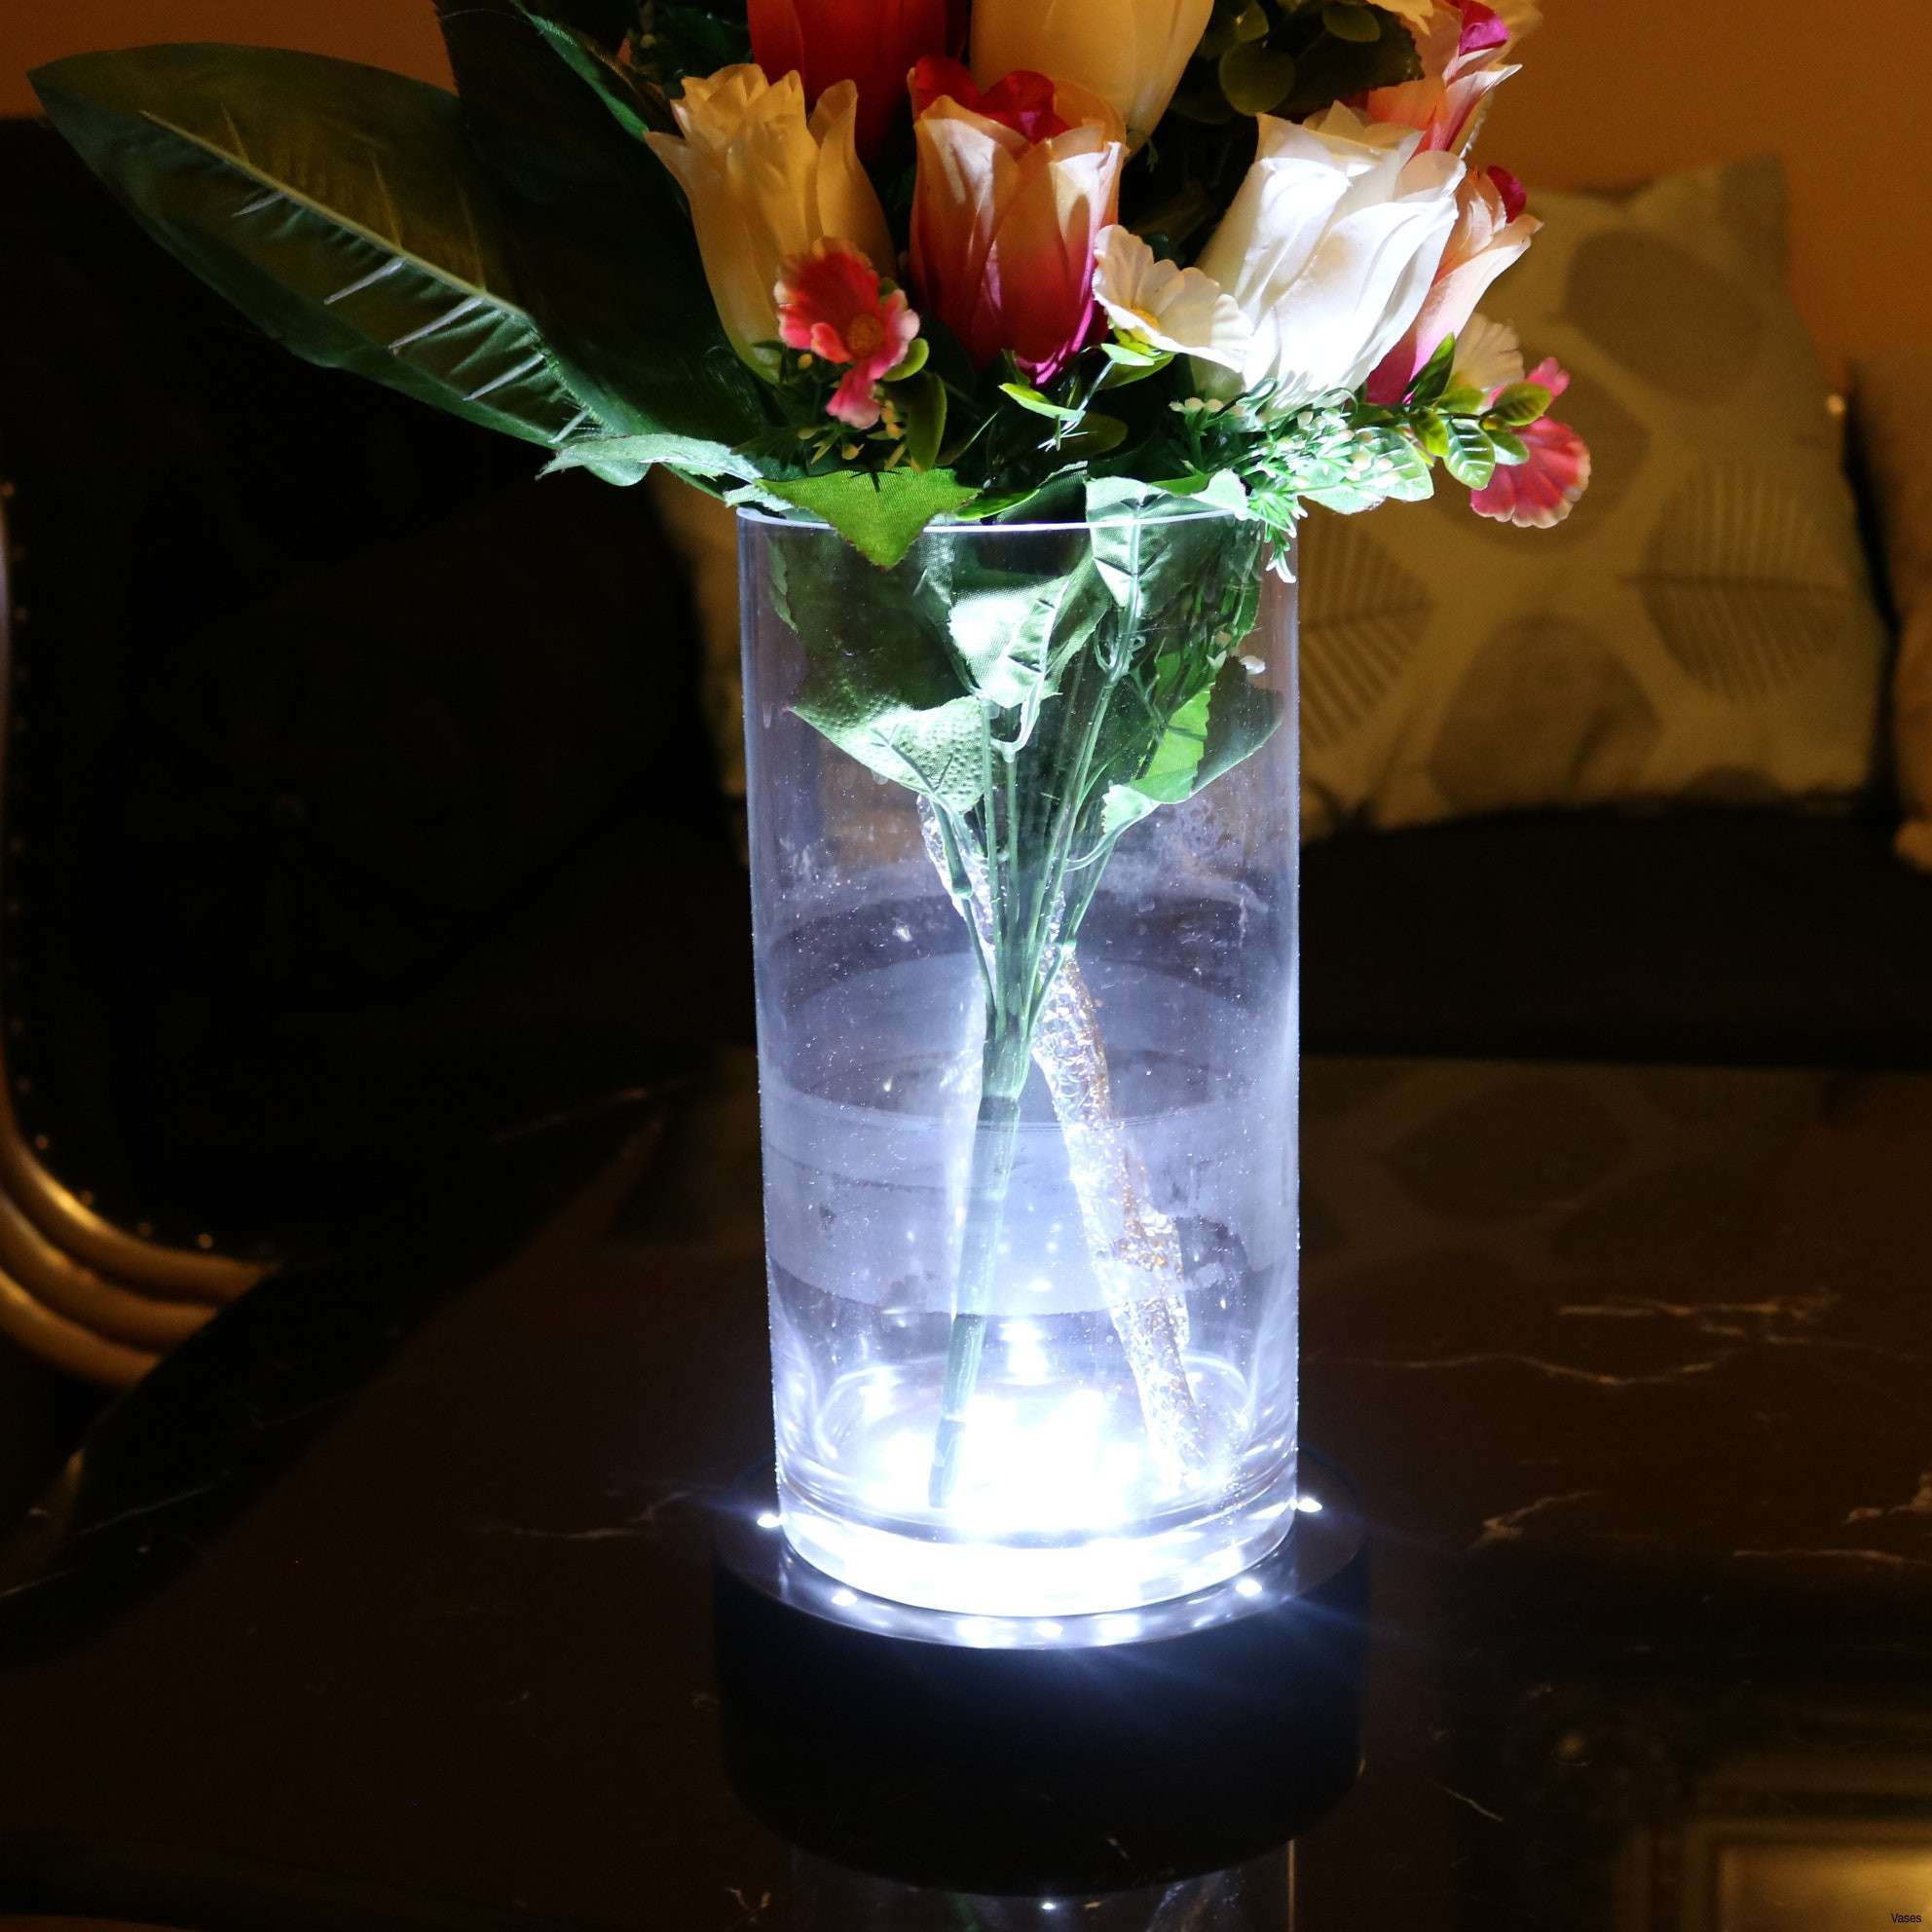 Clear Plastic Cylinder Vases wholesale Of Plastic Cylinder Vase Image Vases Disposable Plastic Single Cheap within Plastic Cylinder Vase Image Vases Disposable Plastic Single Cheap Flower Rose Vasei 0d Design